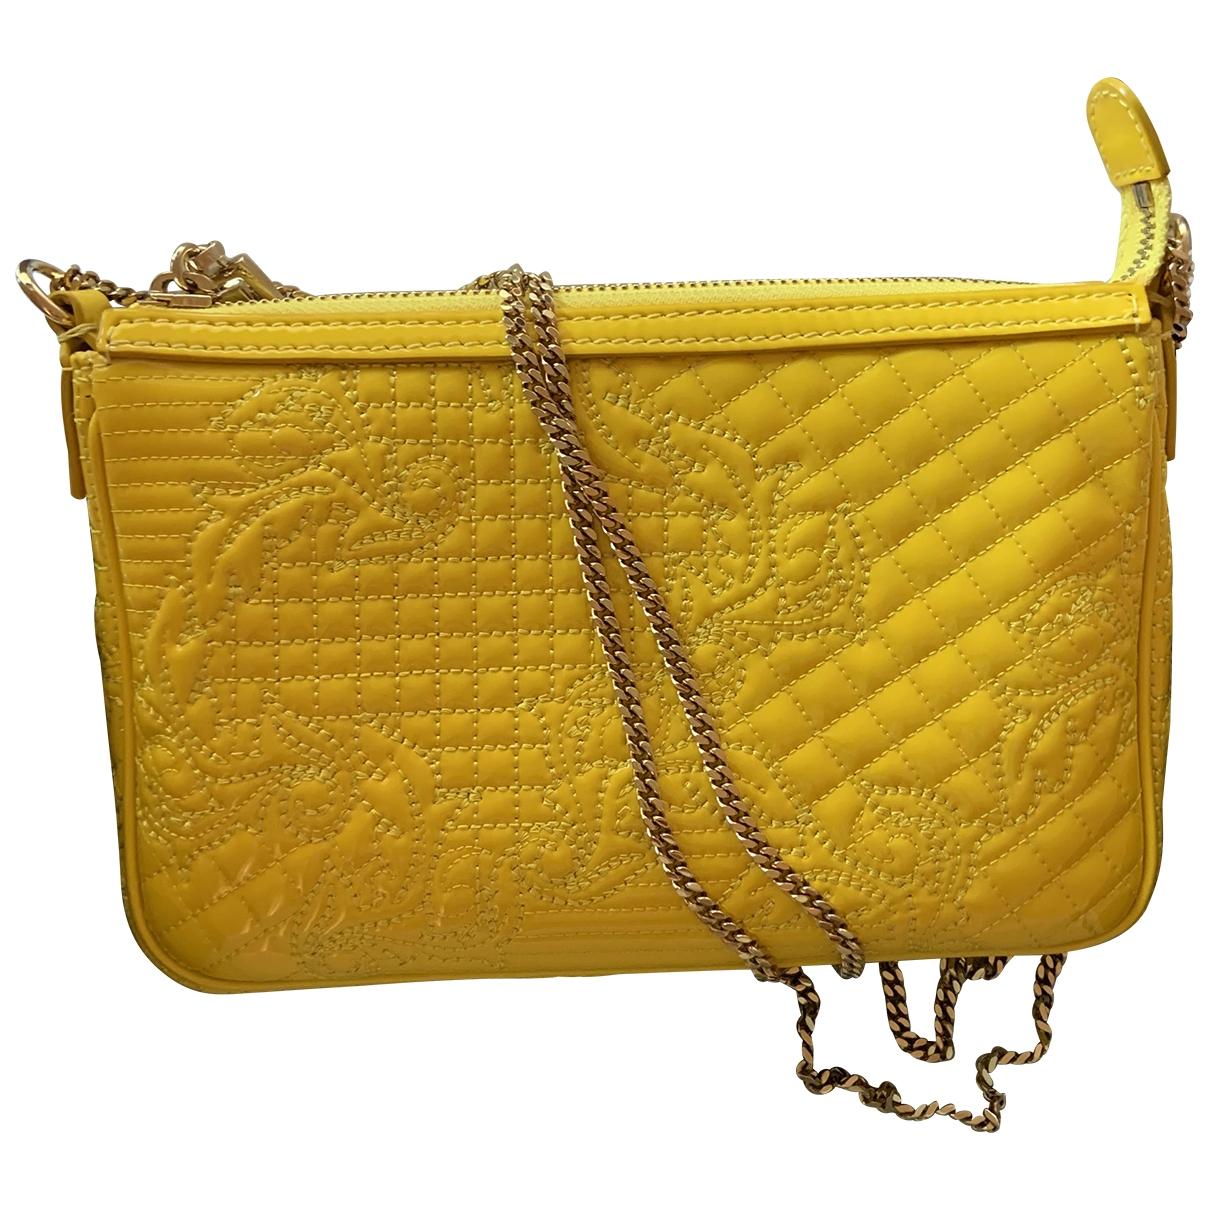 Gianni Versace \N Clutch in  Gelb Lackleder